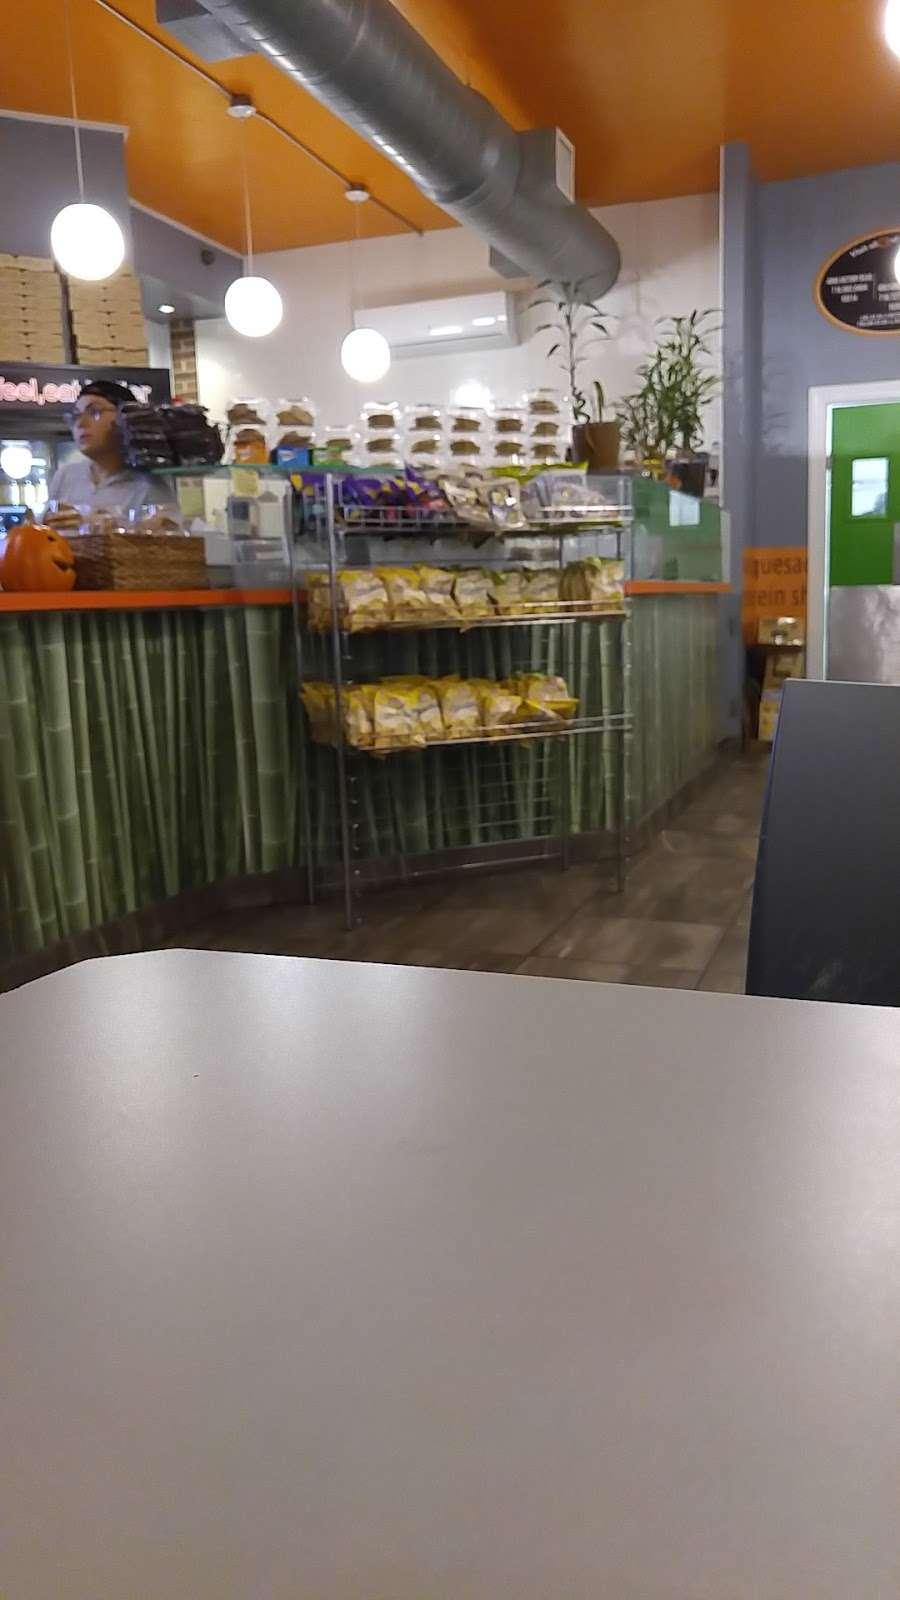 Better Gourmet Health Kitchen - restaurant  | Photo 3 of 6 | Address: 400 Forest Ave, Staten Island, NY 10301, USA | Phone: (718) 727-2800